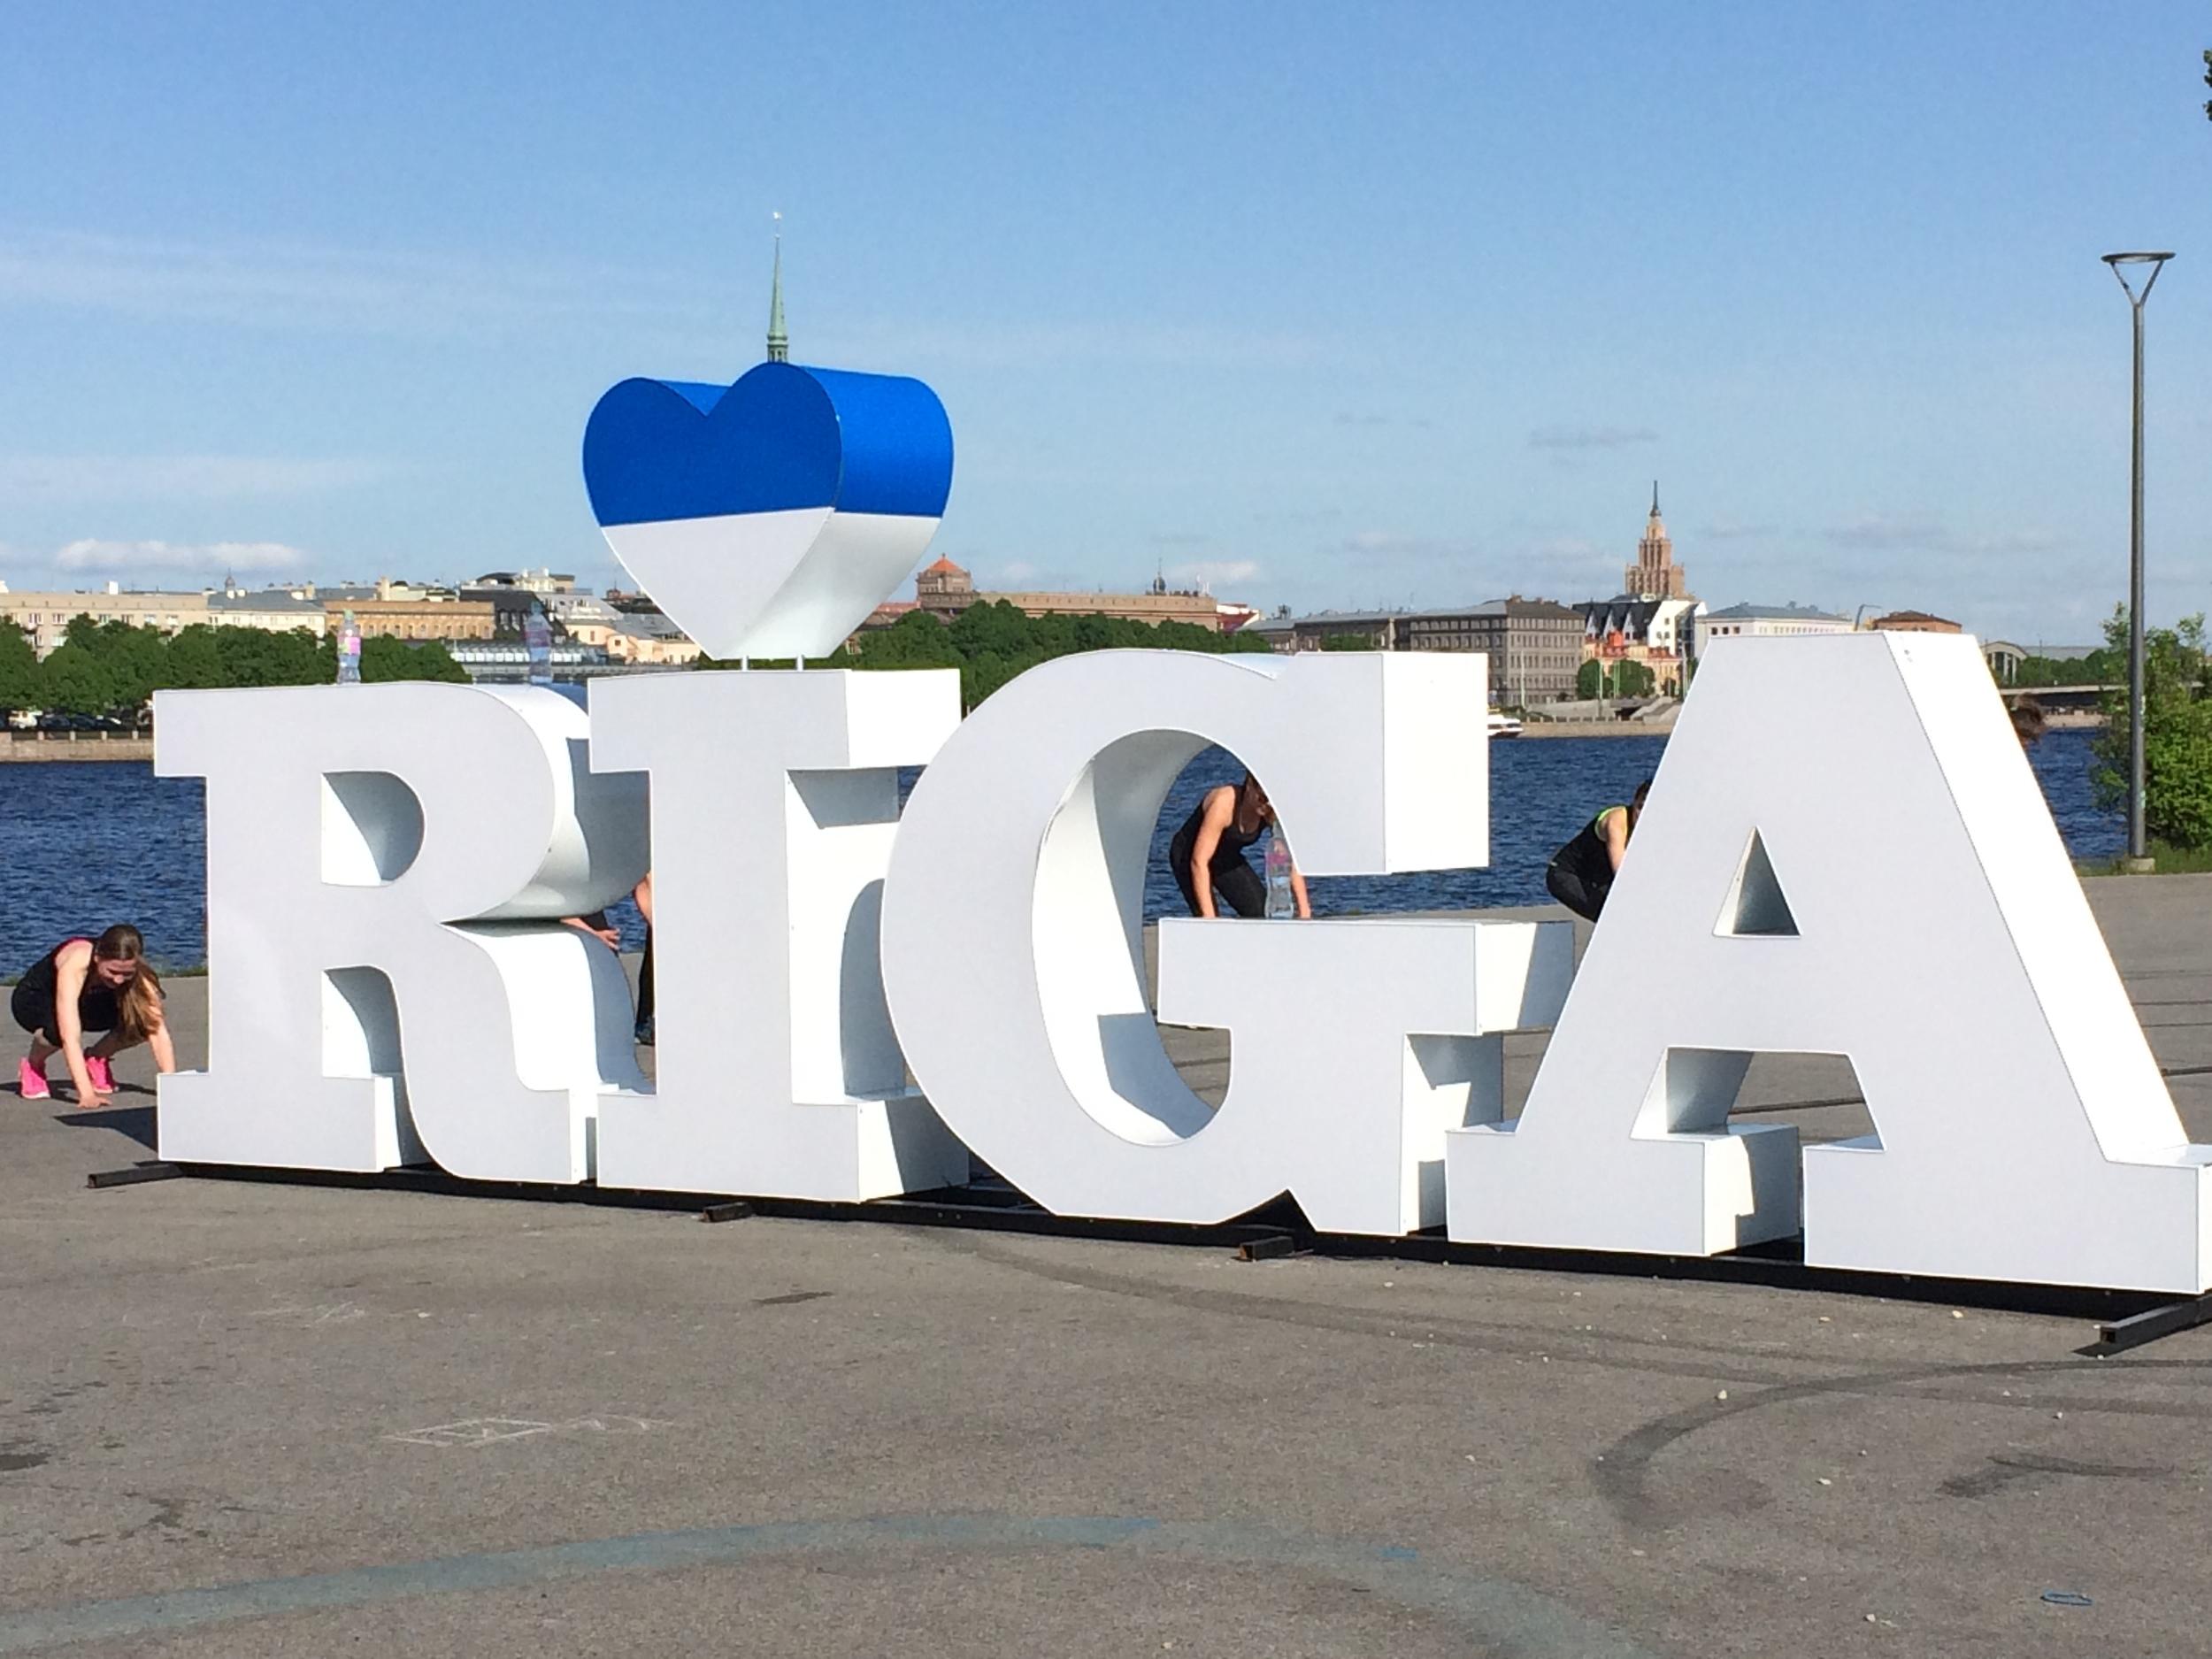 Crossfit enthusiasts heart Riga